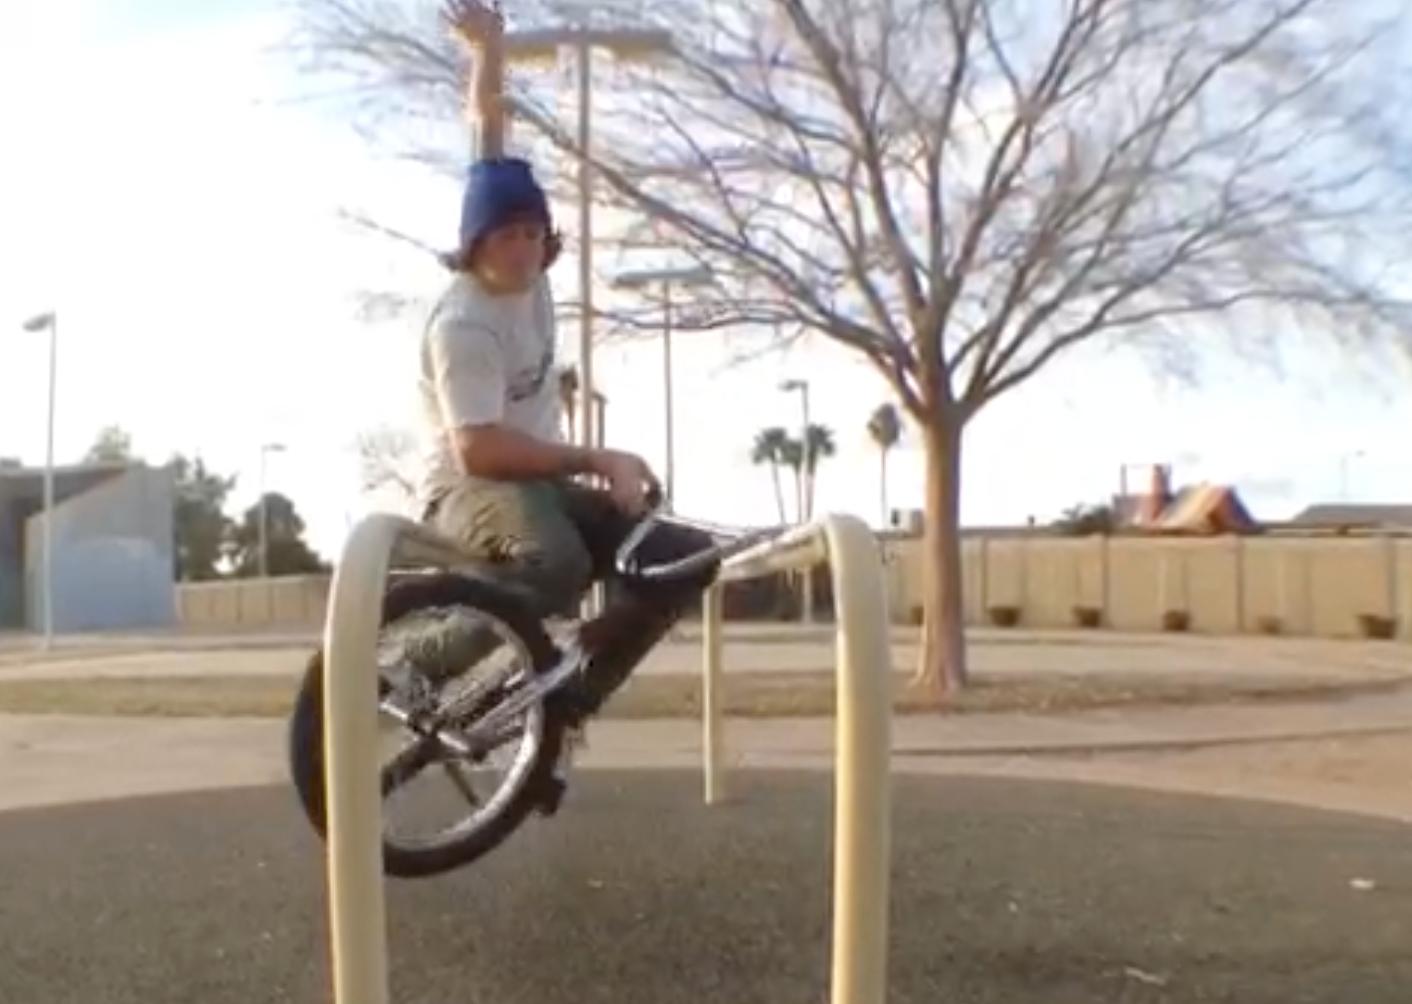 Josh Betley's #GETCREATIVEVLM Video Entry